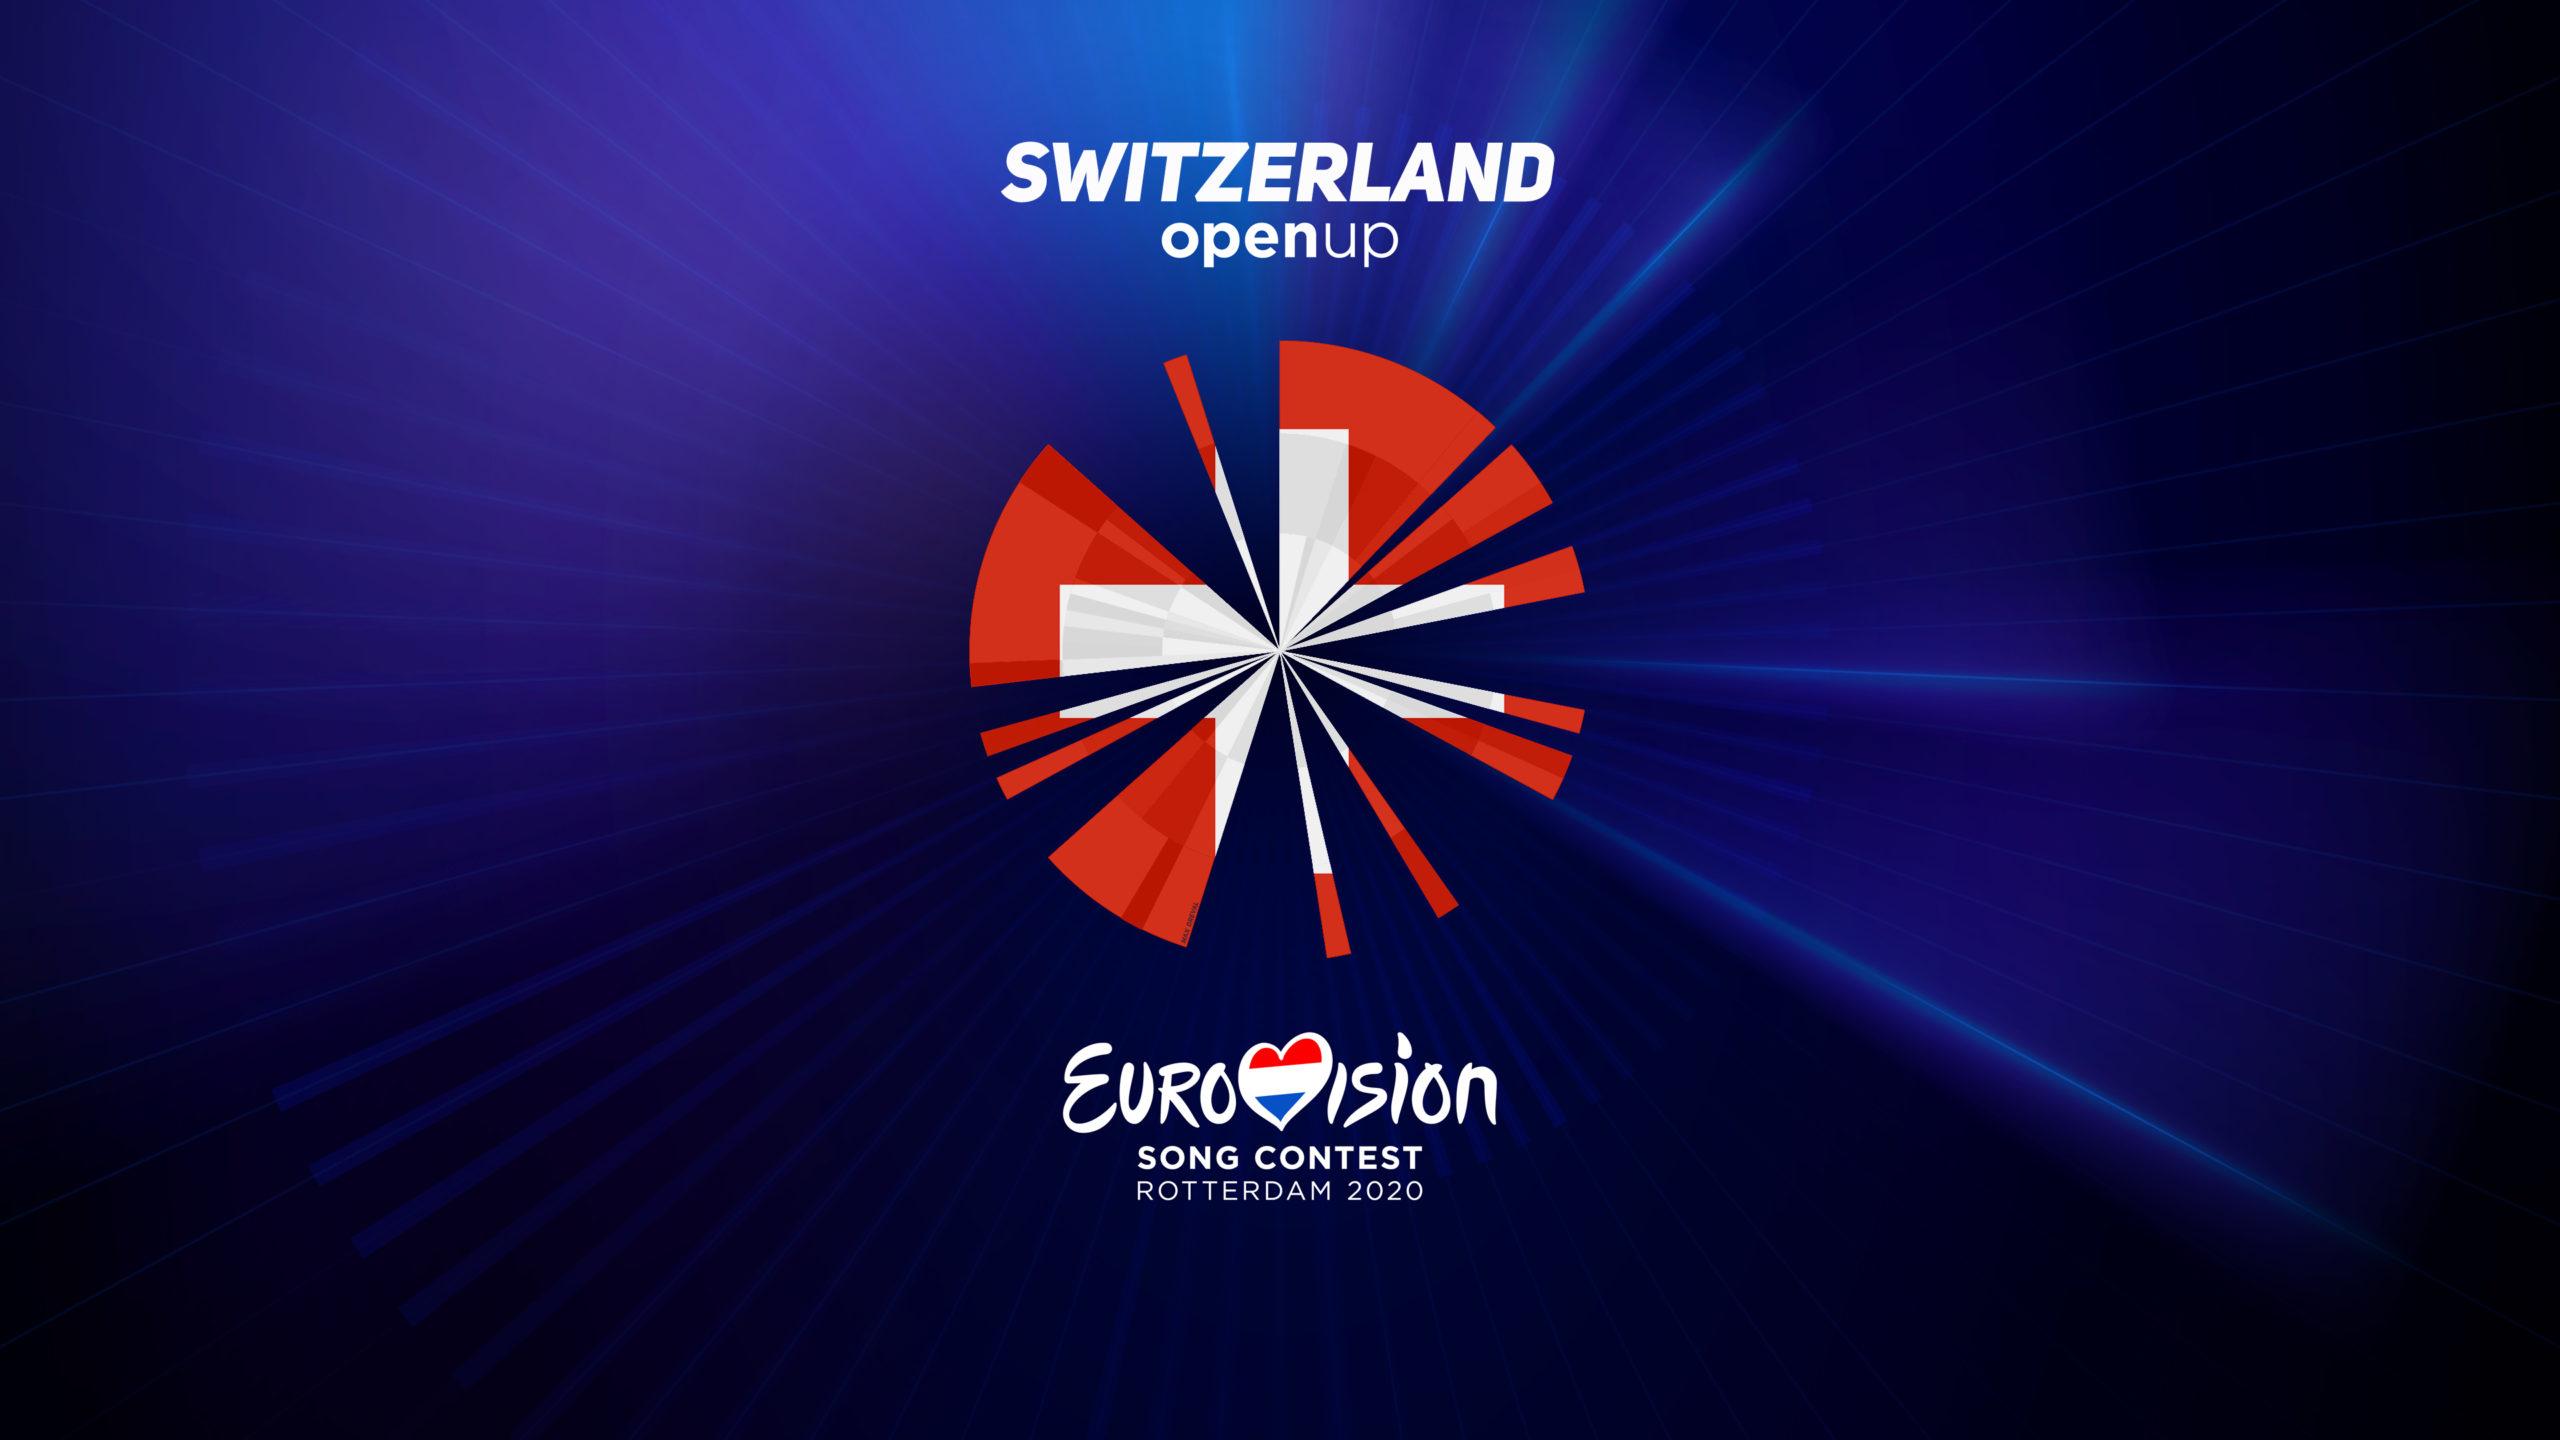 Switzerland-scaled.jpg